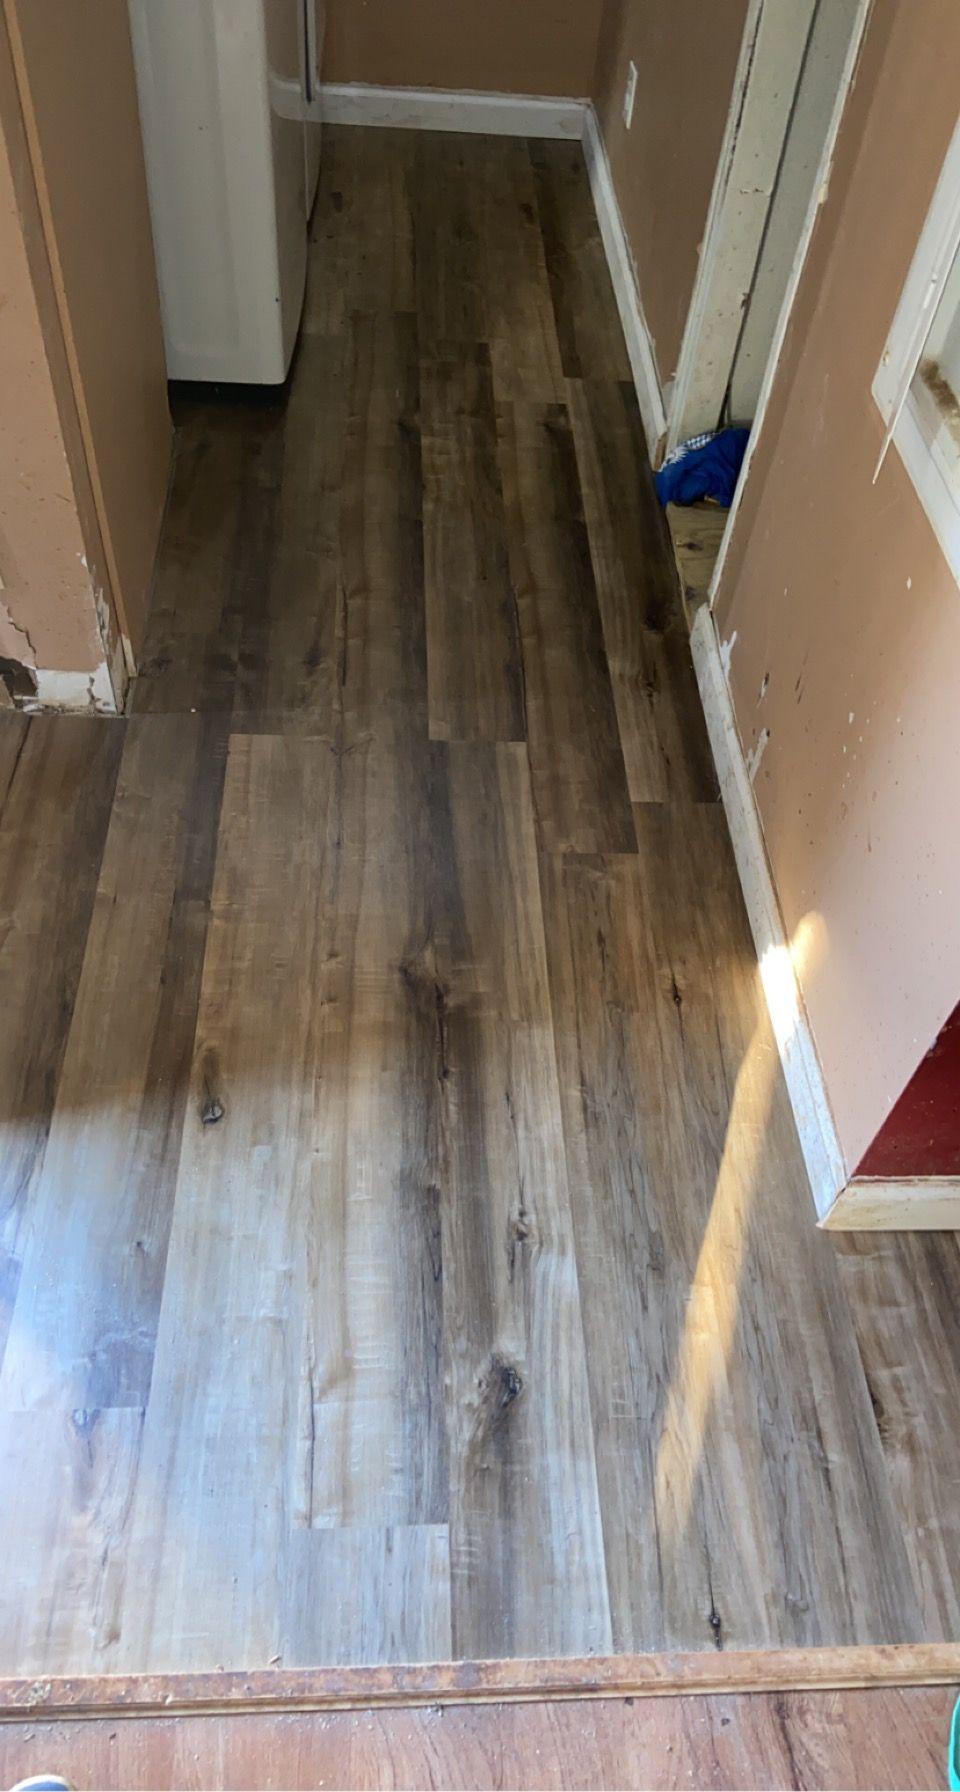 Replace subfloor and add vinyl floors